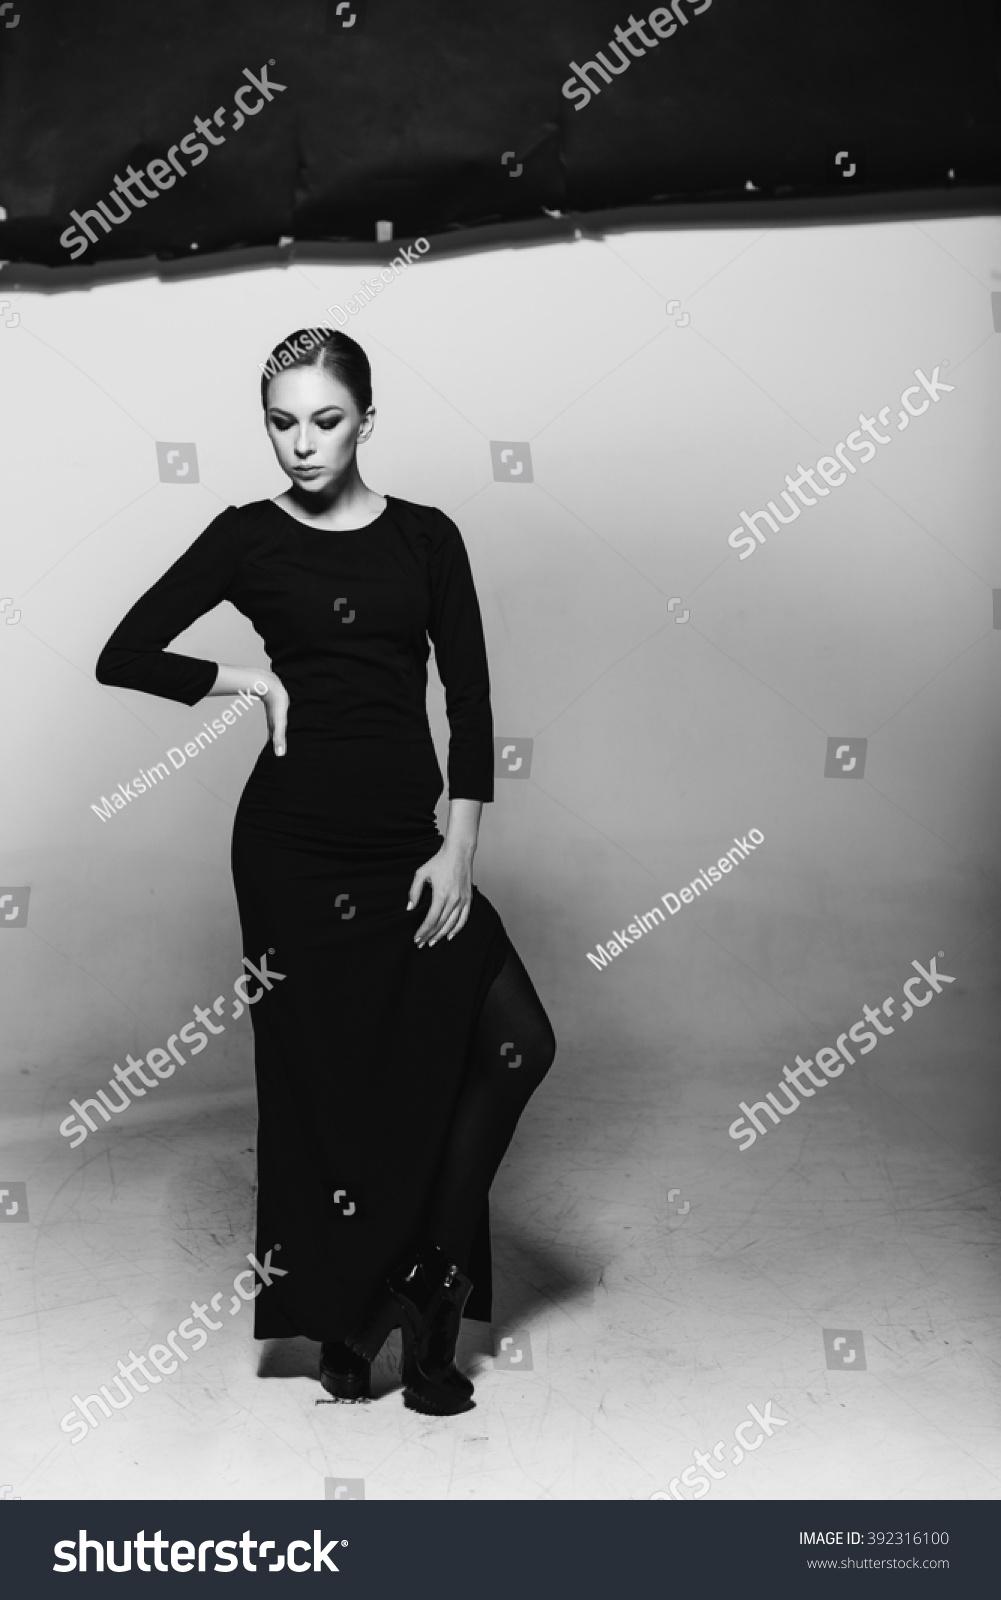 Charismatic womandramatic poses black and white photo studio photography negativity